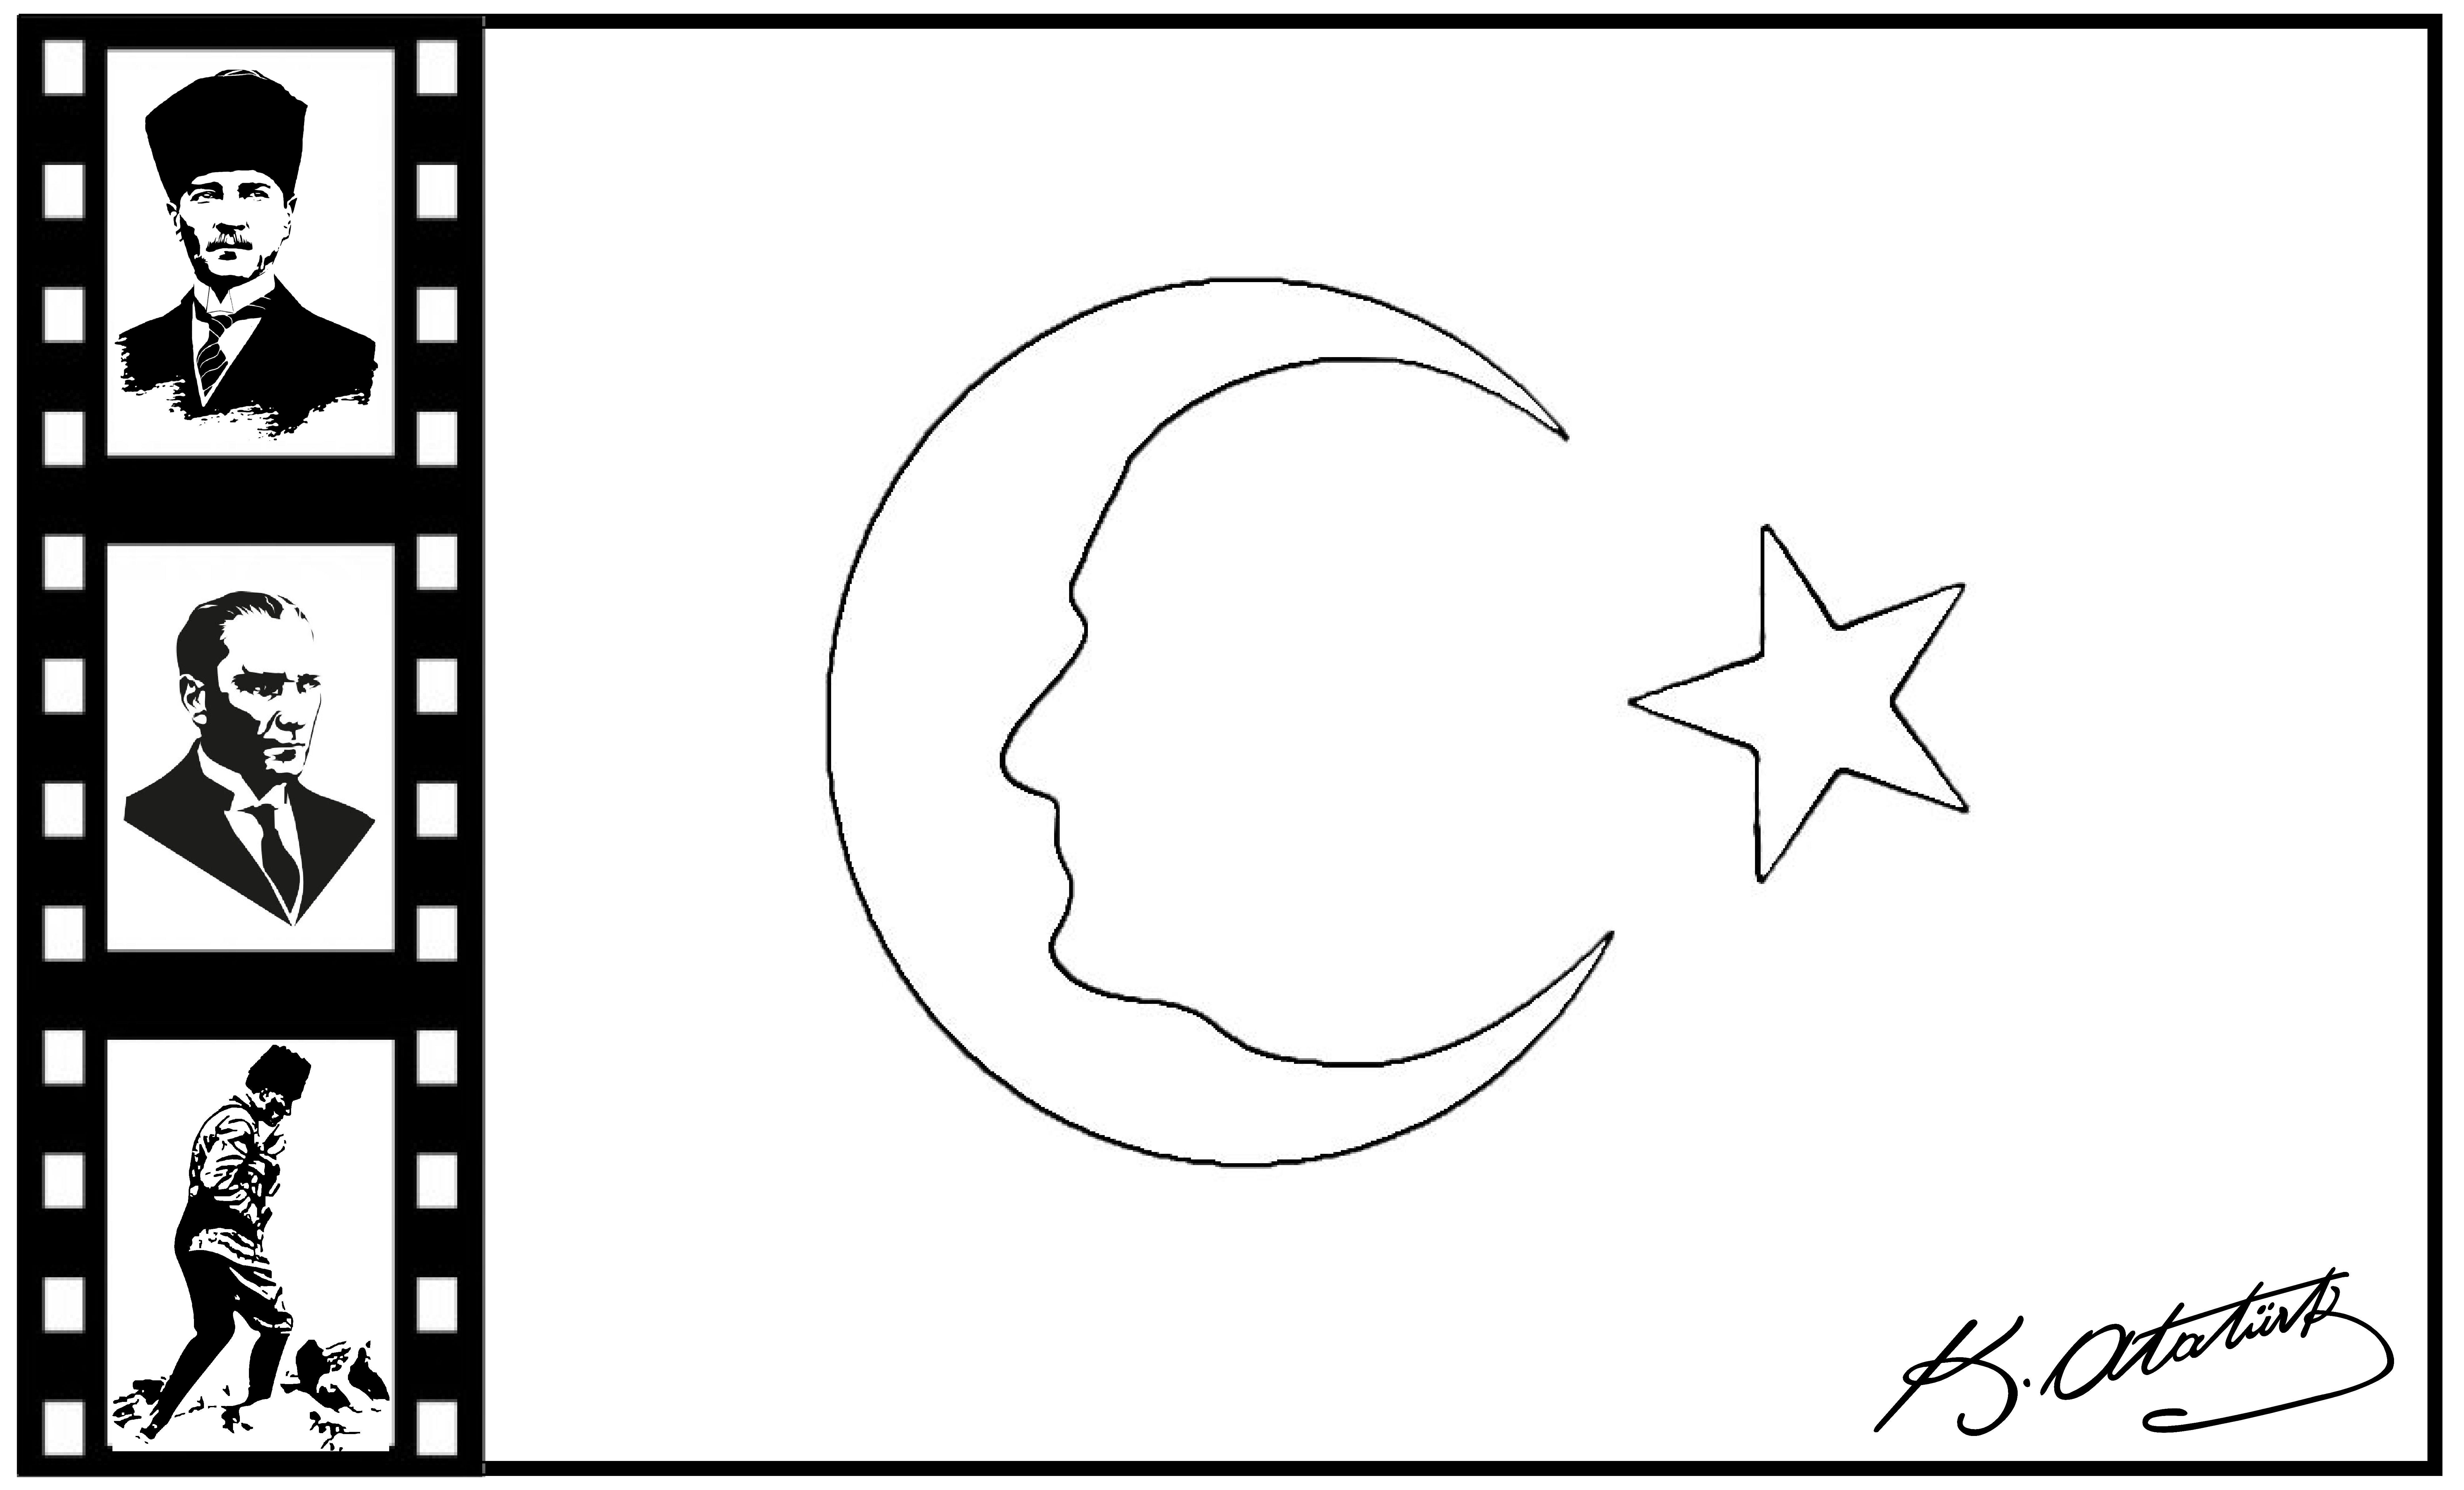 Pinar Turk Adli Kullanicinin Ataturk Panolari Panosundaki Pin